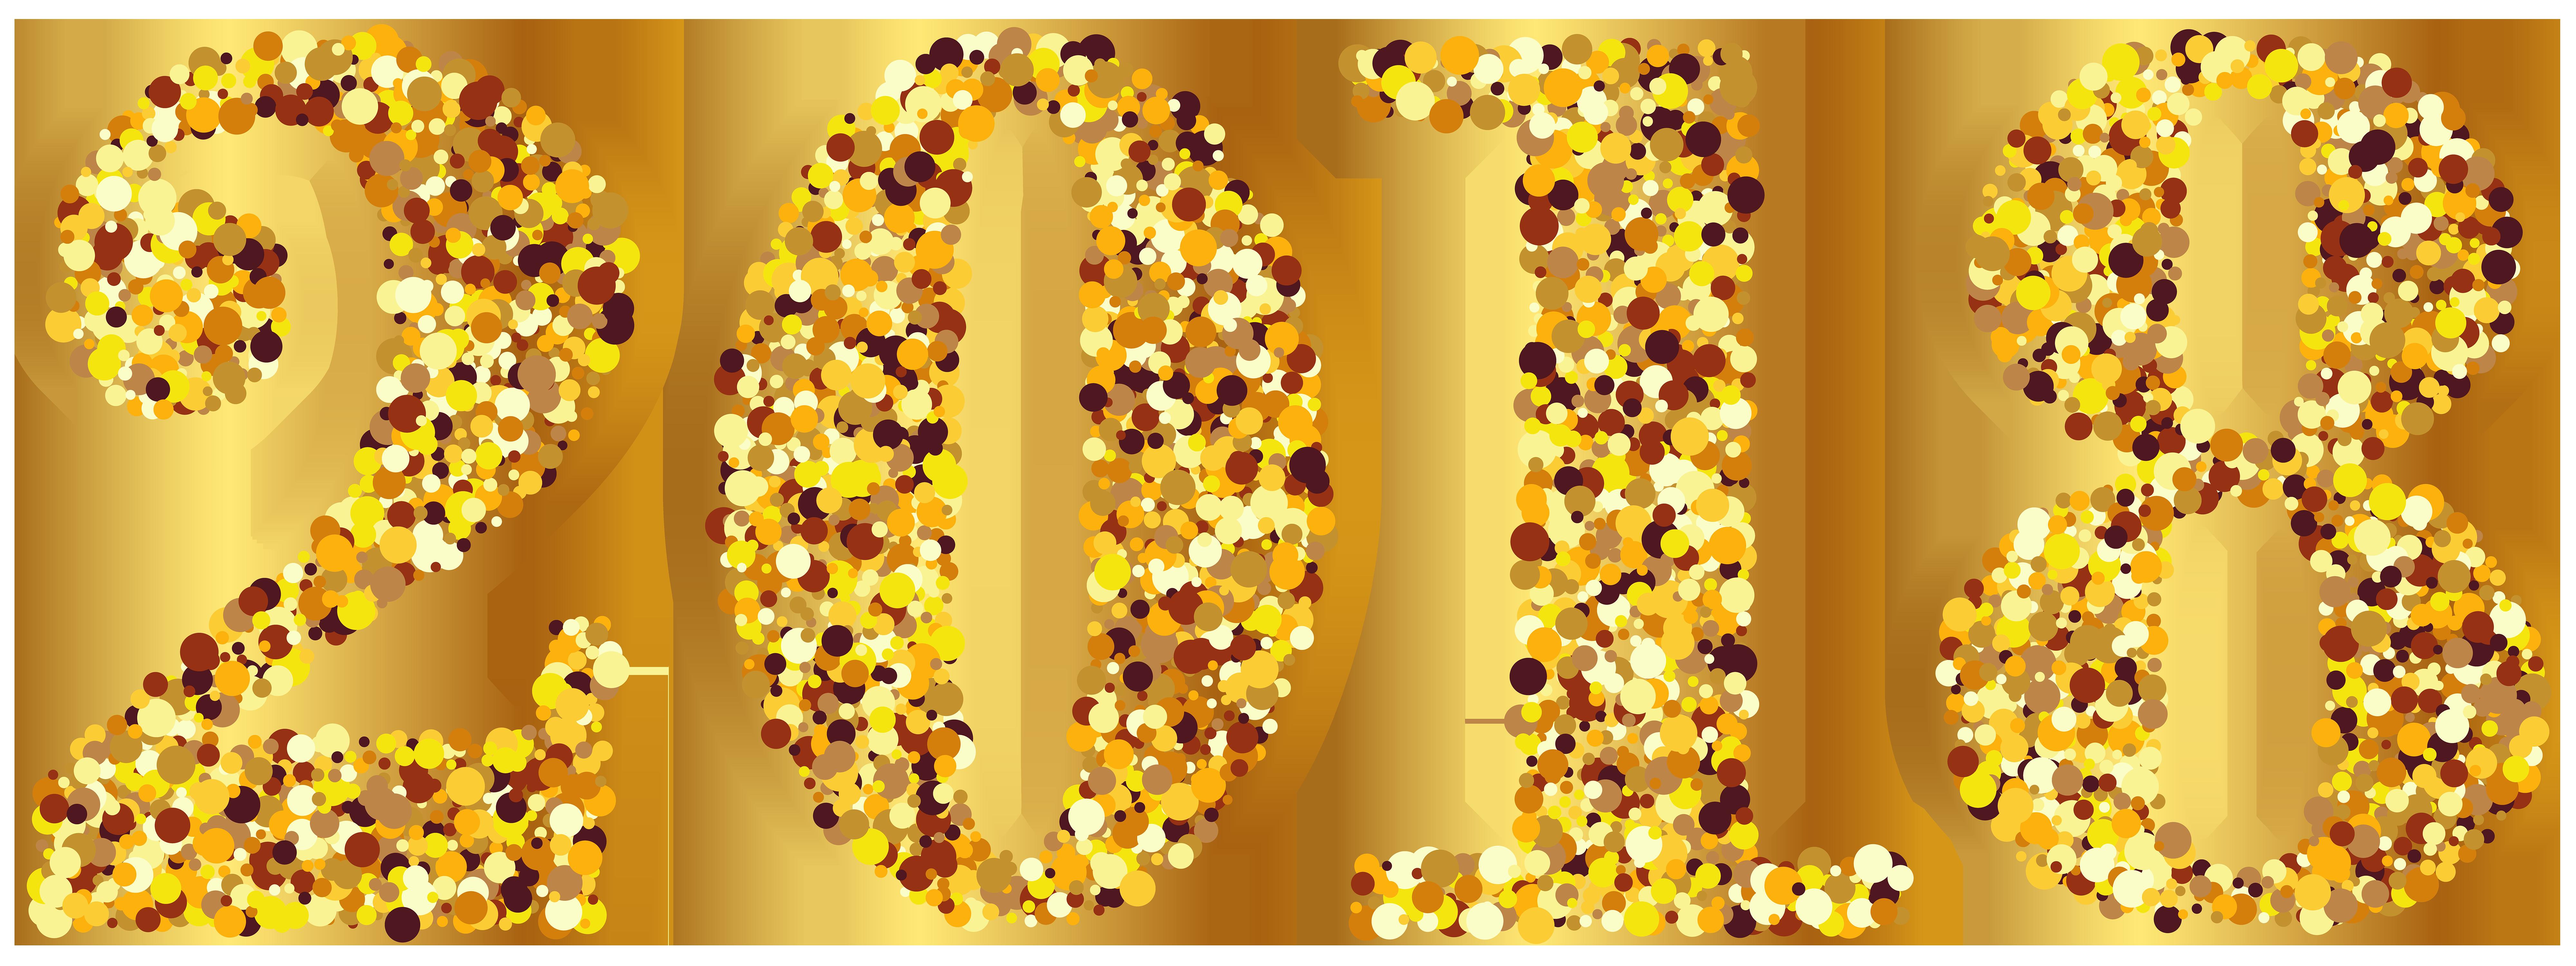 2018 Gold Transparent Clip Art Image.